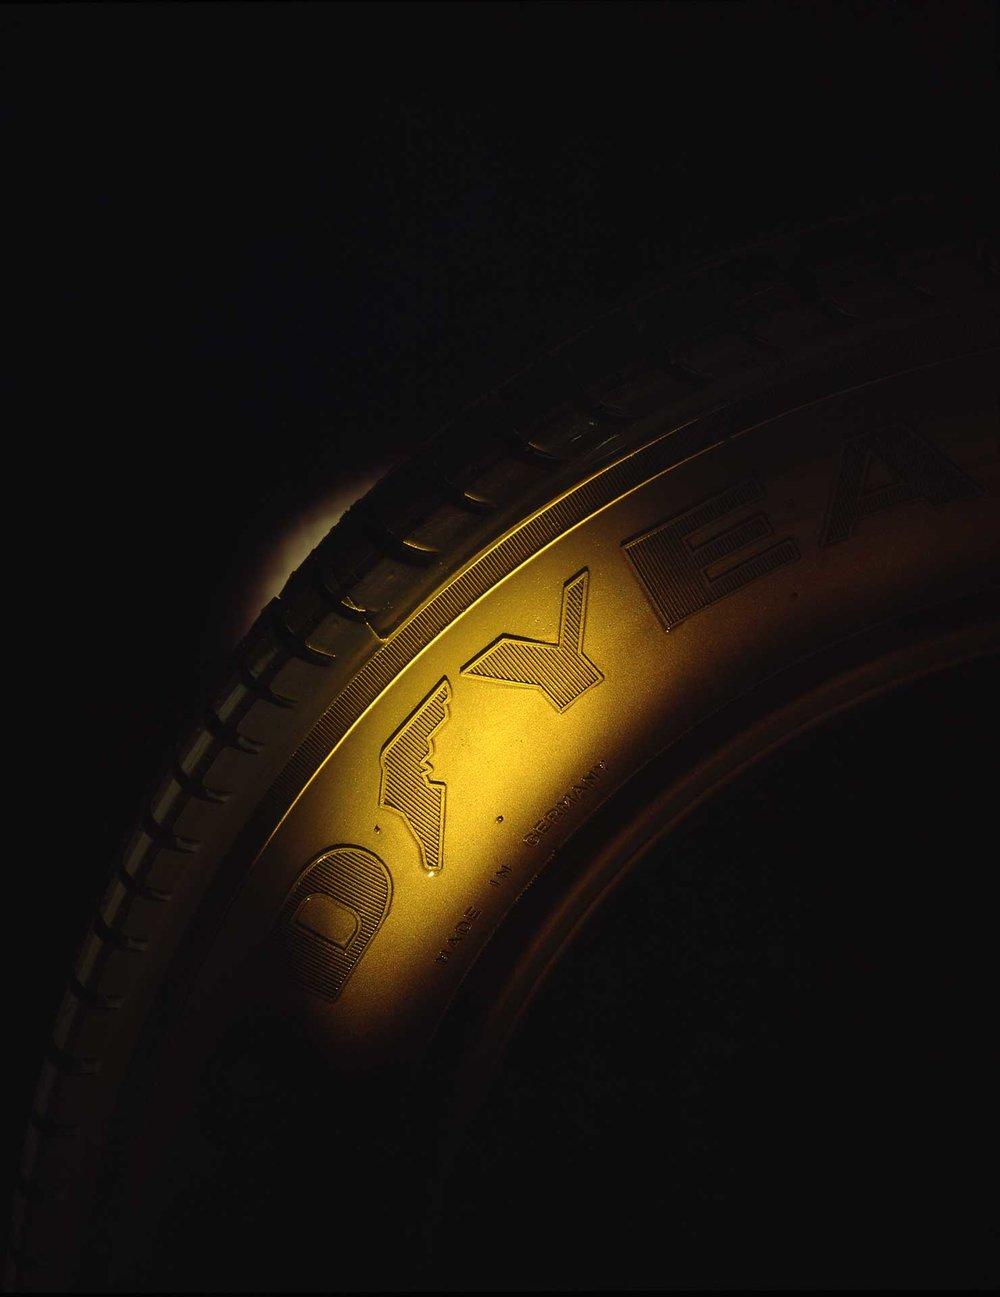 tire_goodyear_logo_scandinavian_ad_McCann_Erikson_brand_establishment.jpg